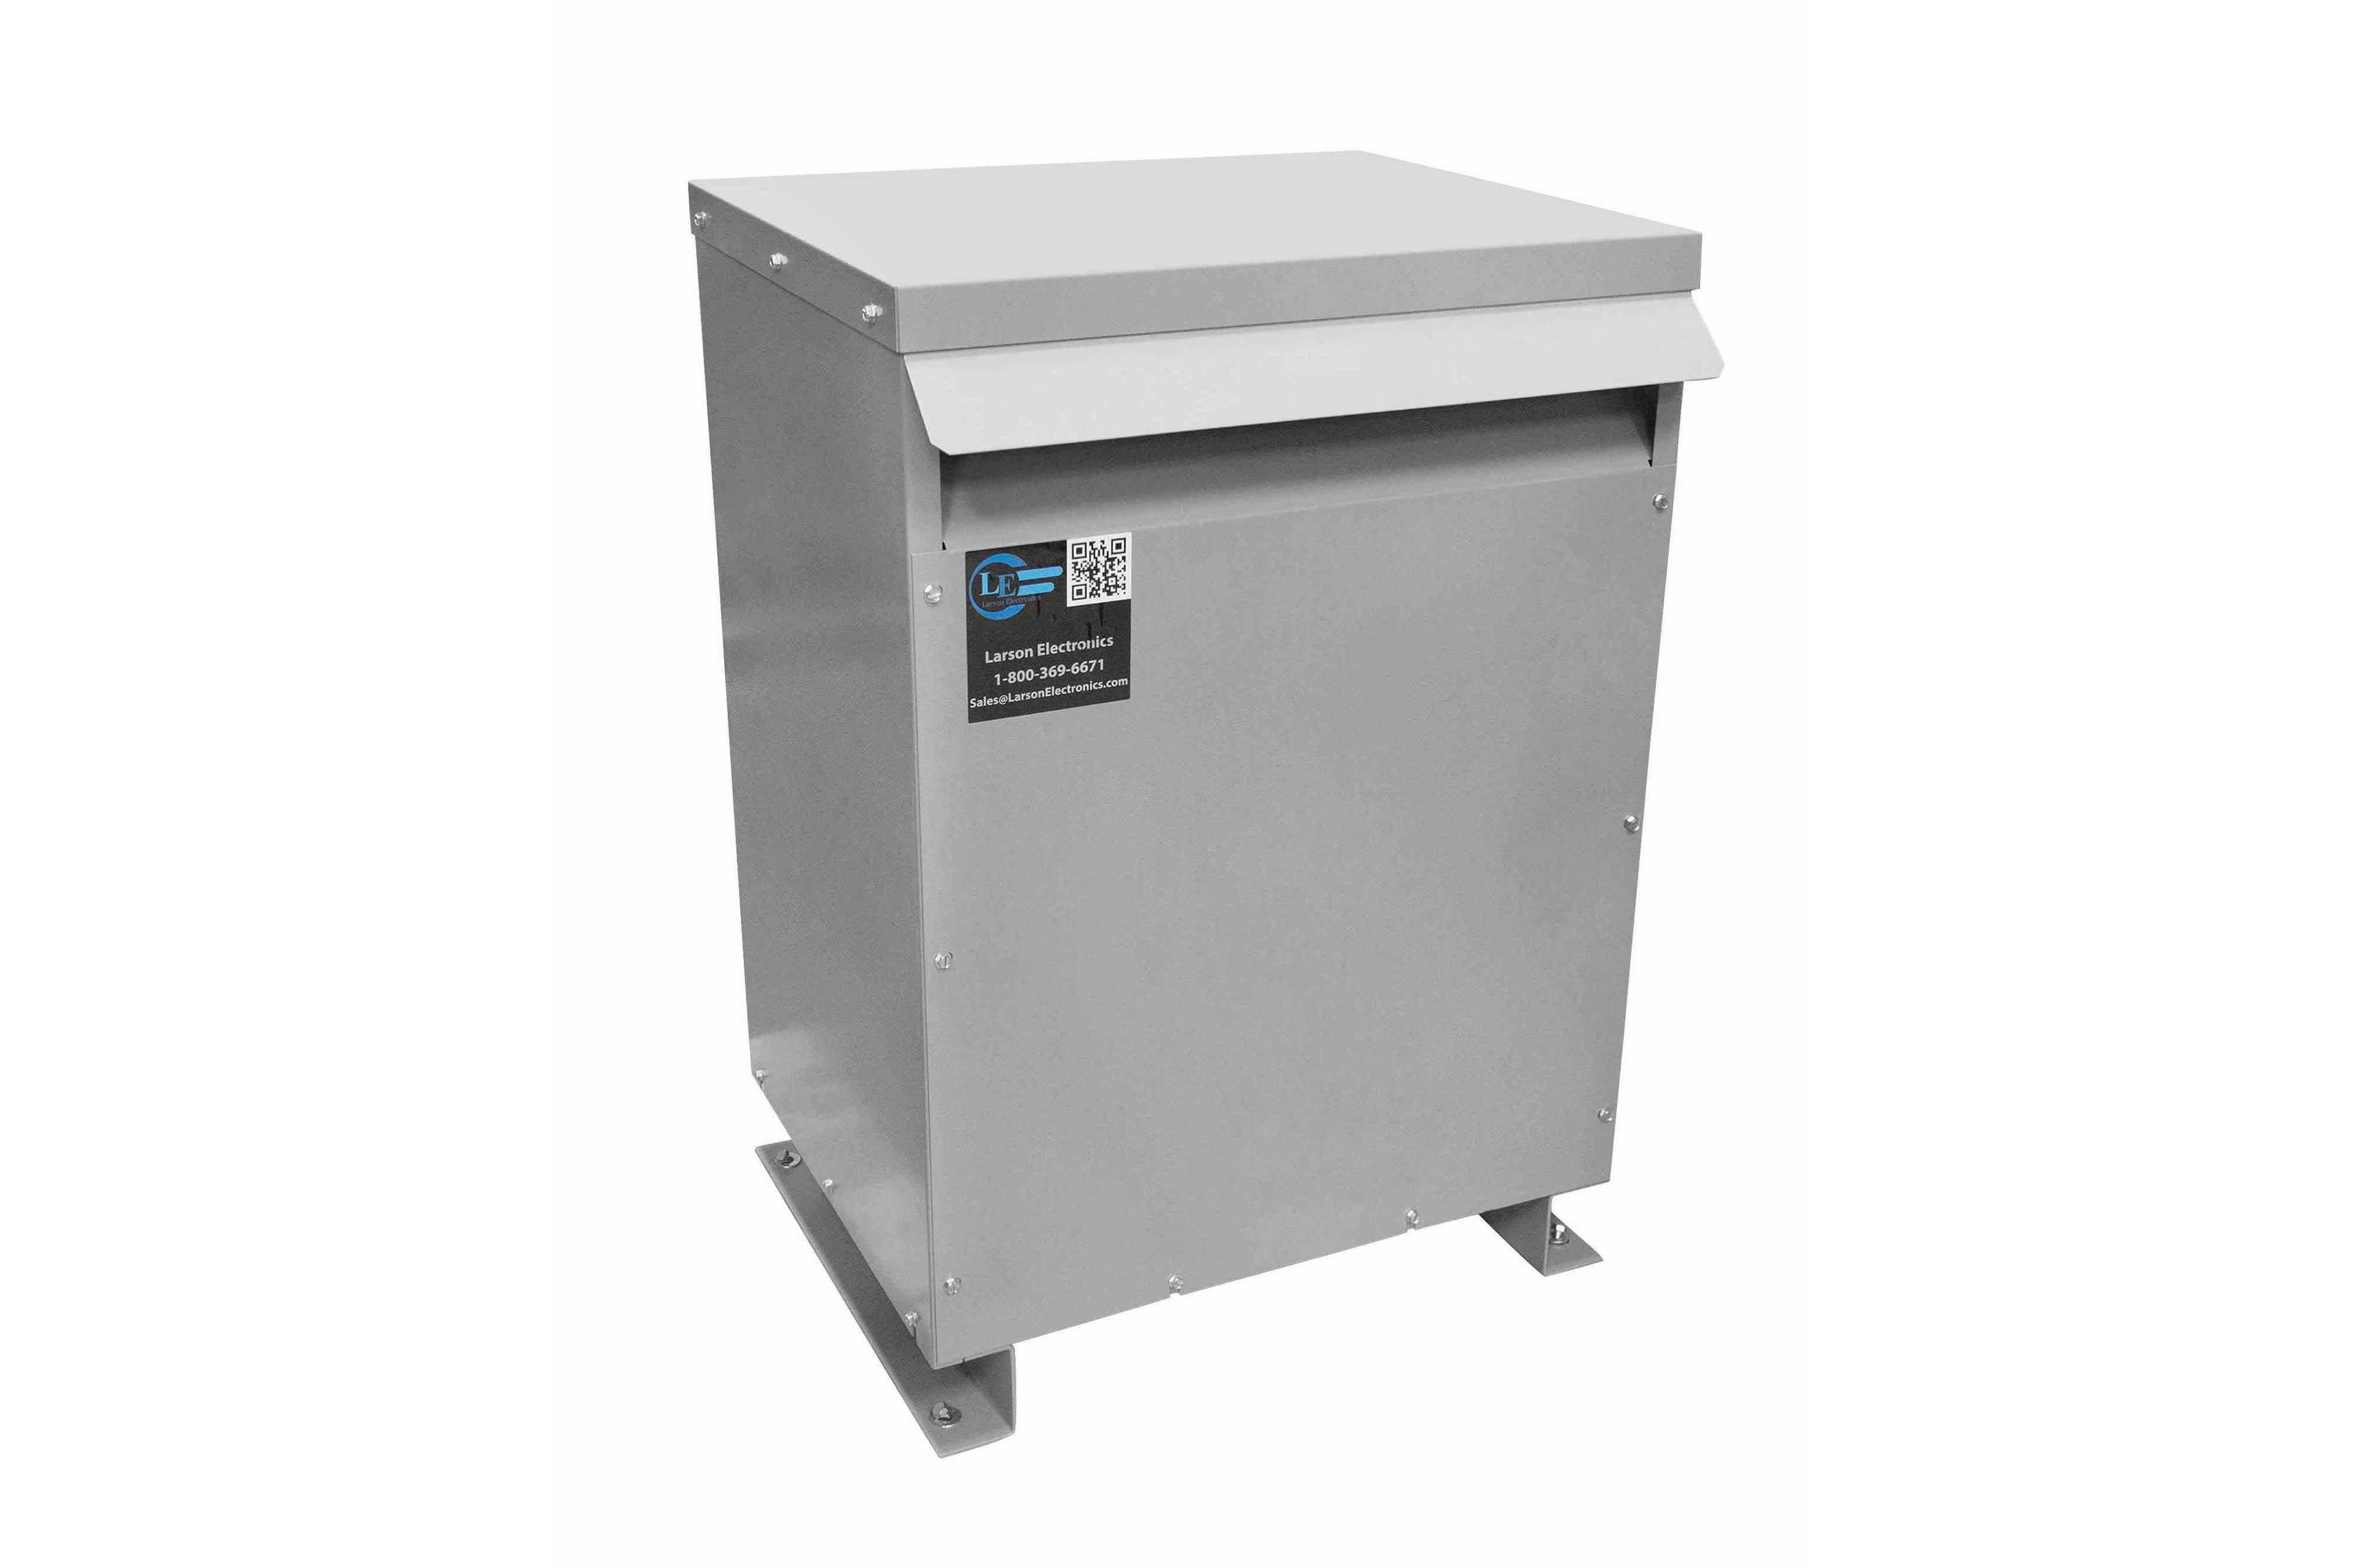 112.5 kVA 3PH Isolation Transformer, 600V Wye Primary, 480V Delta Secondary, N3R, Ventilated, 60 Hz